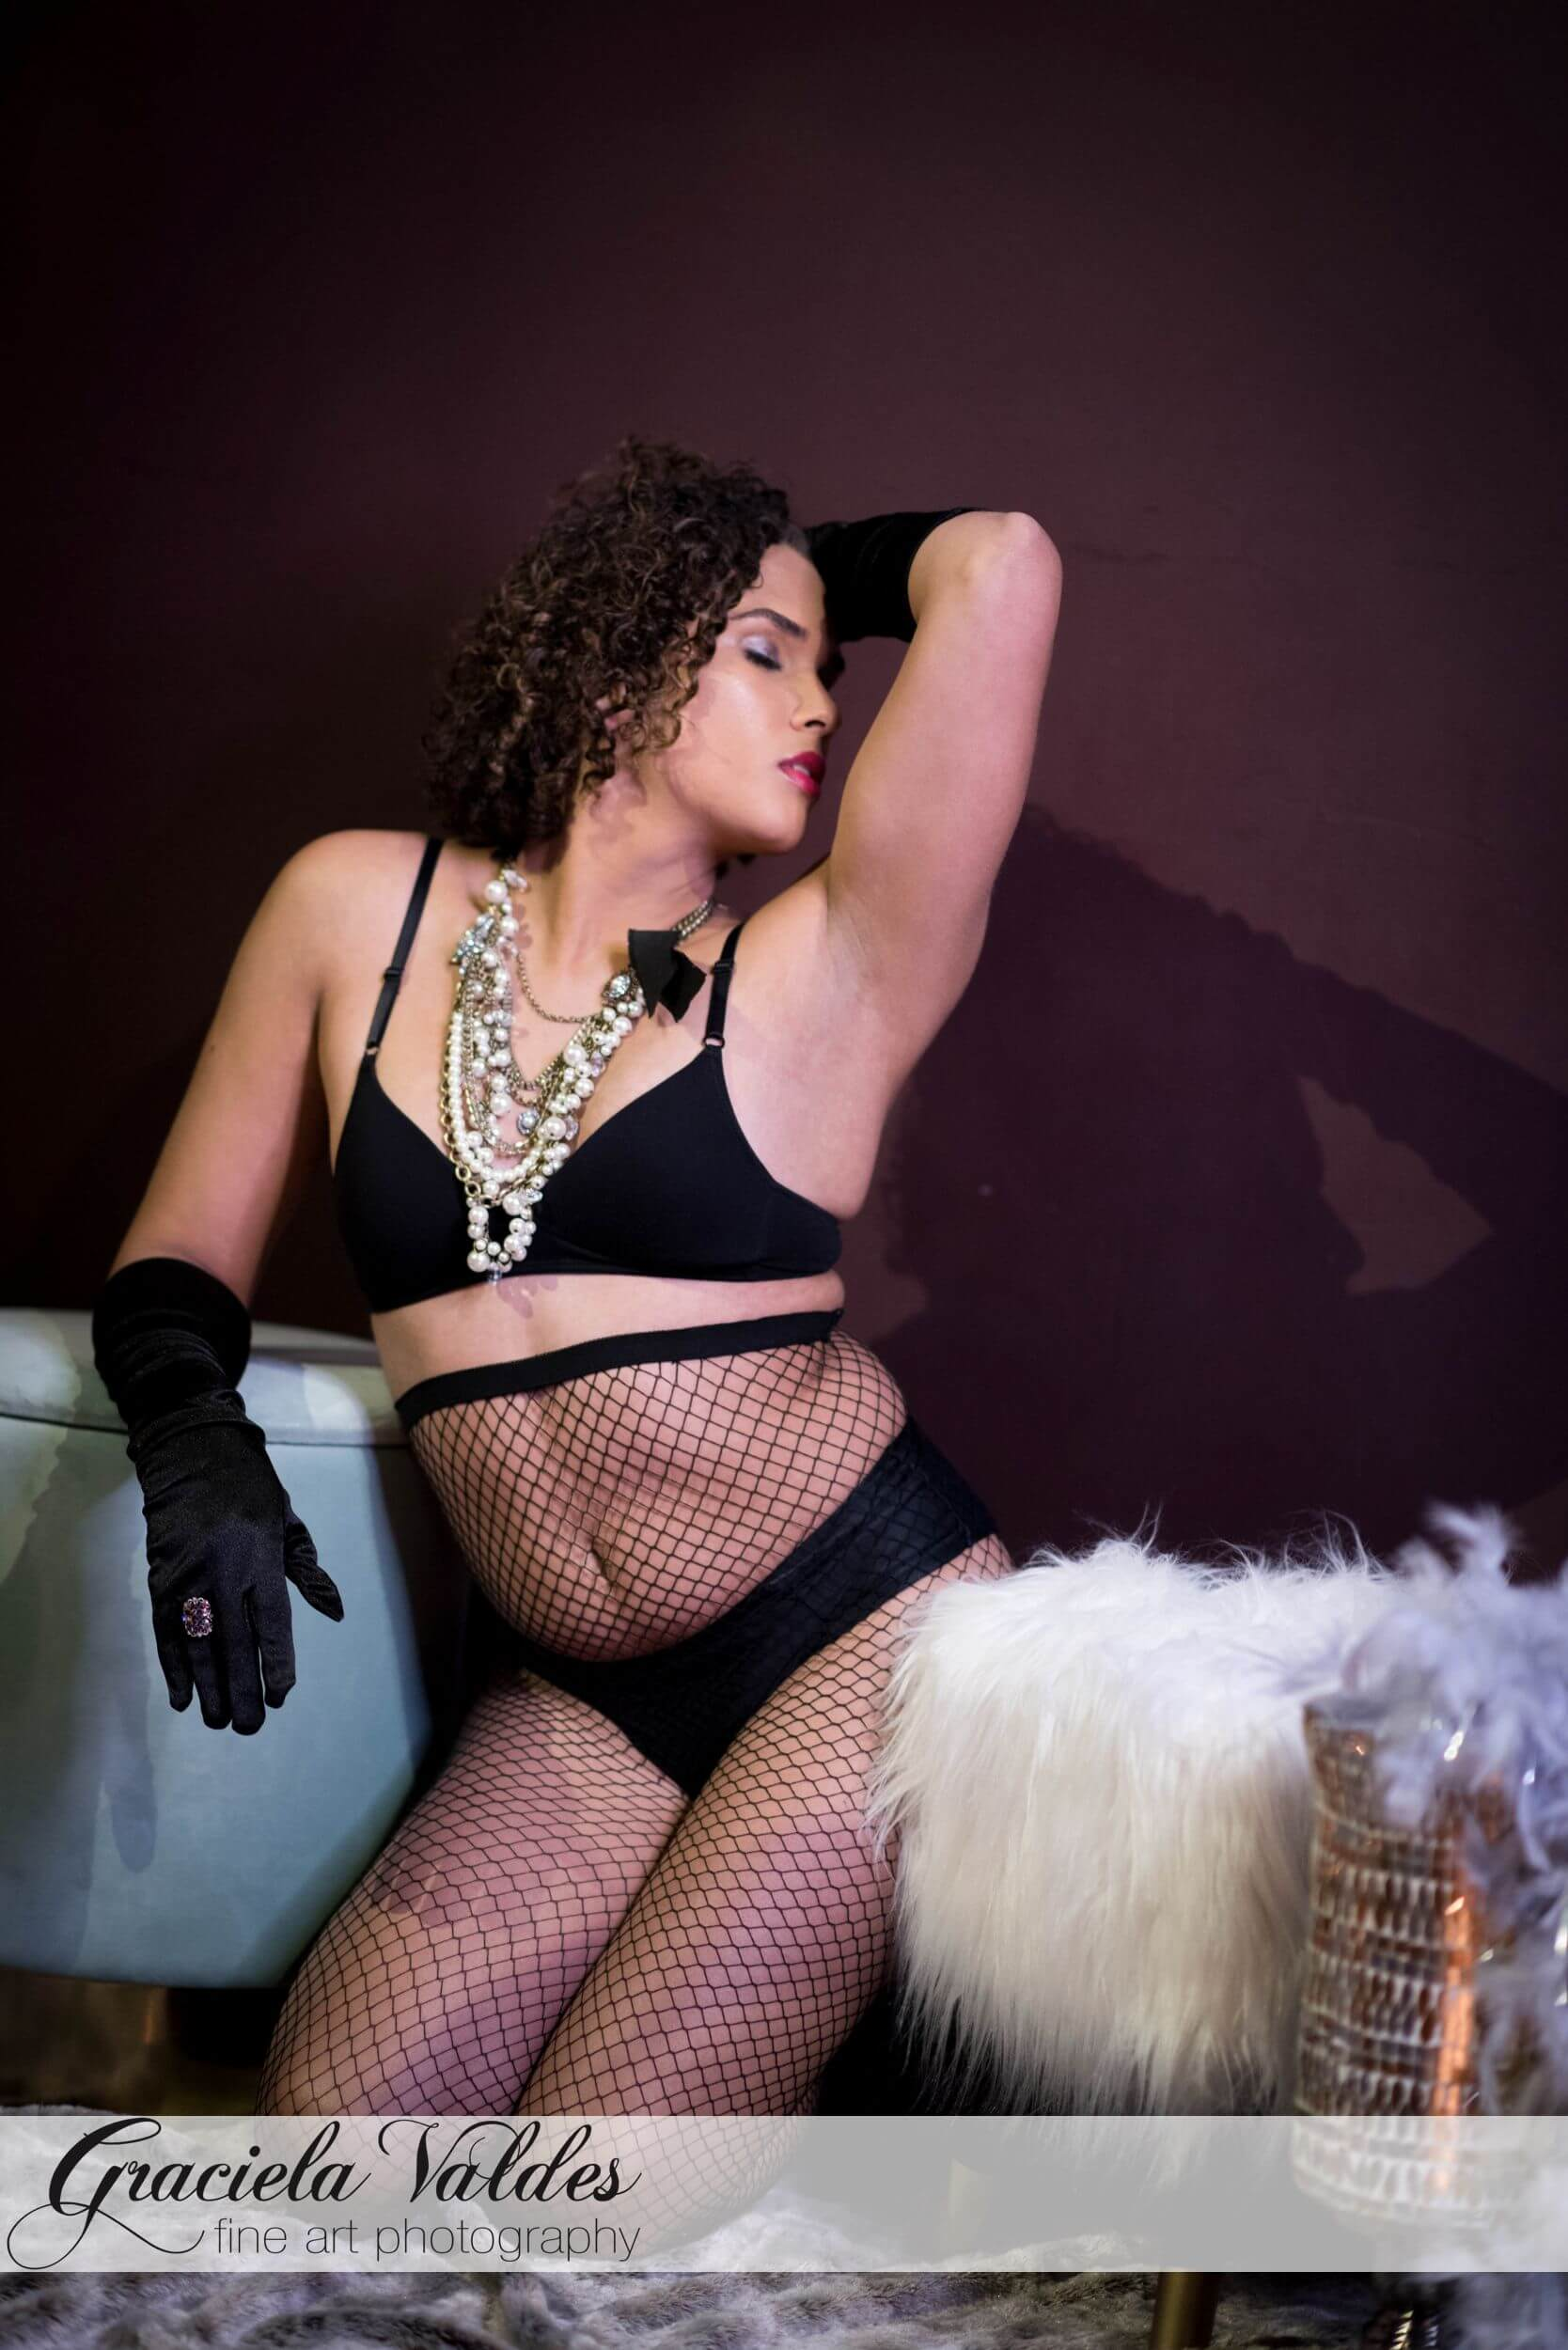 Sex After Dark by Graciela Valdes 74.jpg